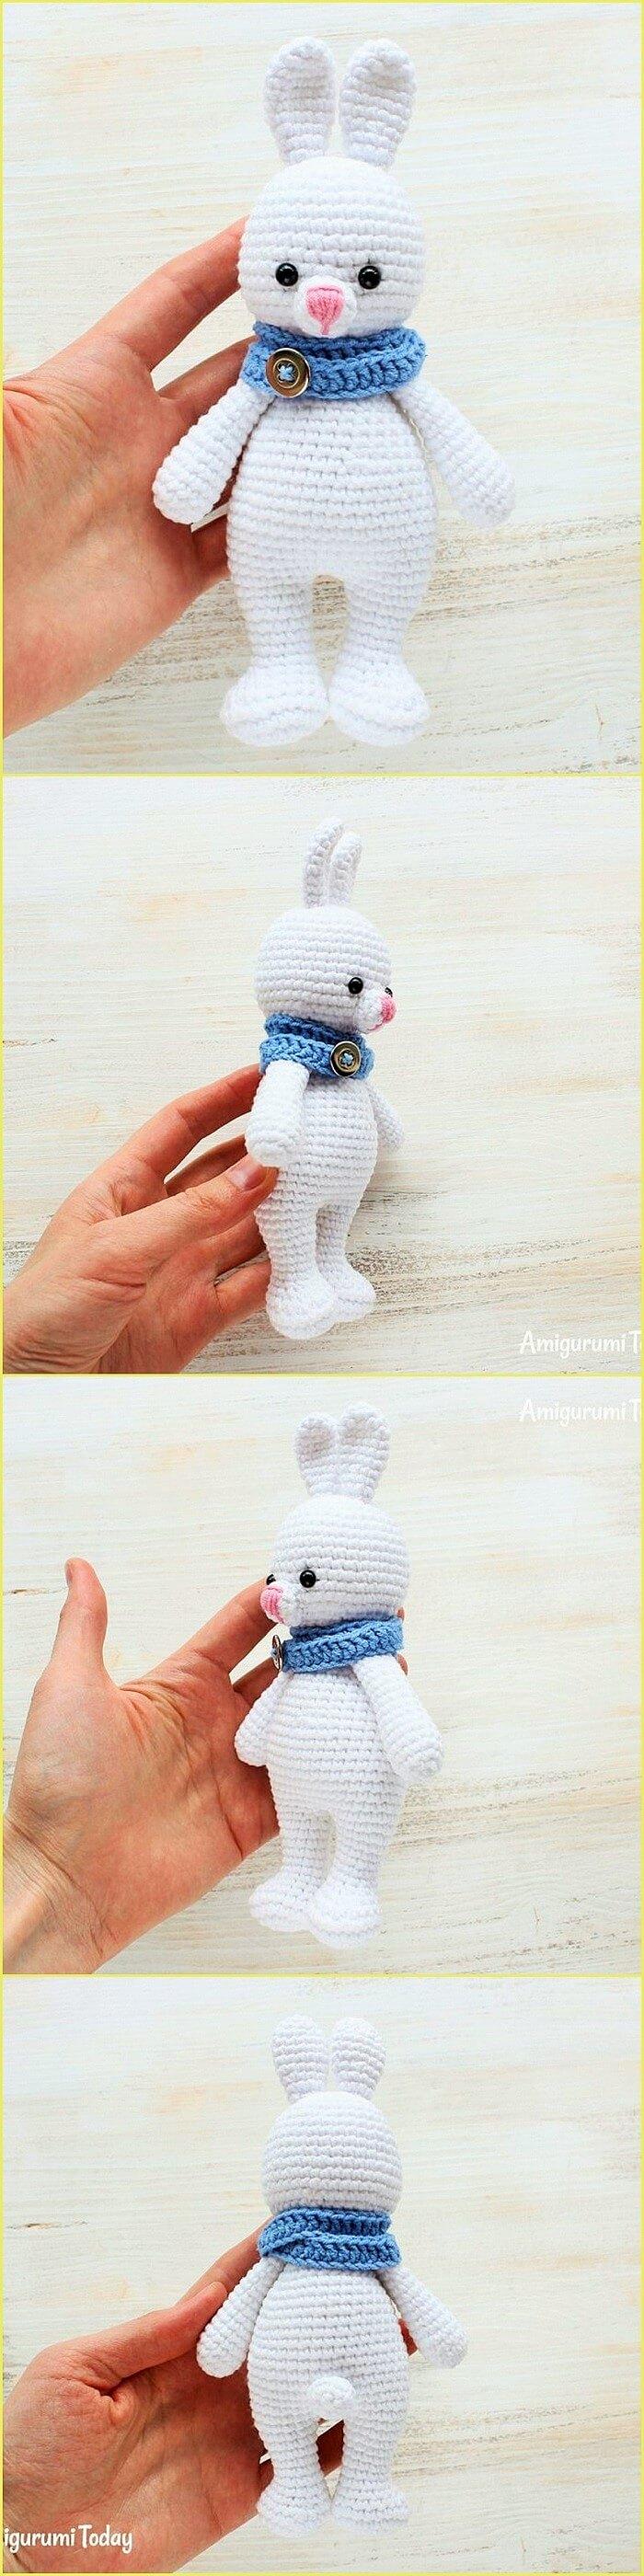 Crochet toys Ideas (4)